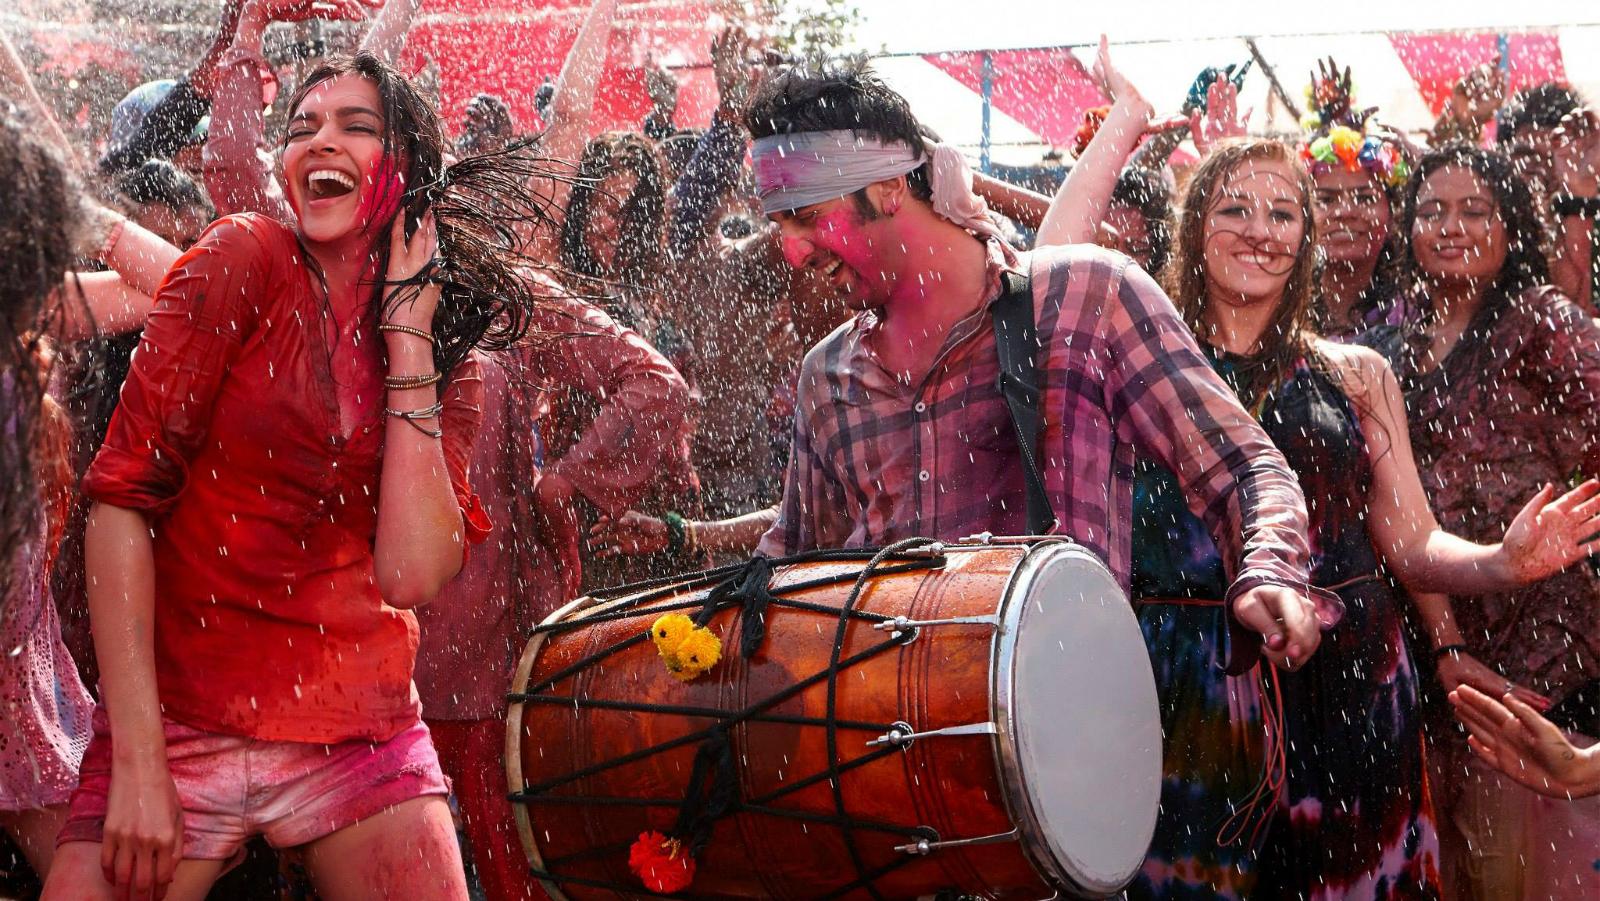 A still from Bollywood film, Yeh Jawaani Hai Deewani, starring Deepika Padukone and Ranbir Kapoor.